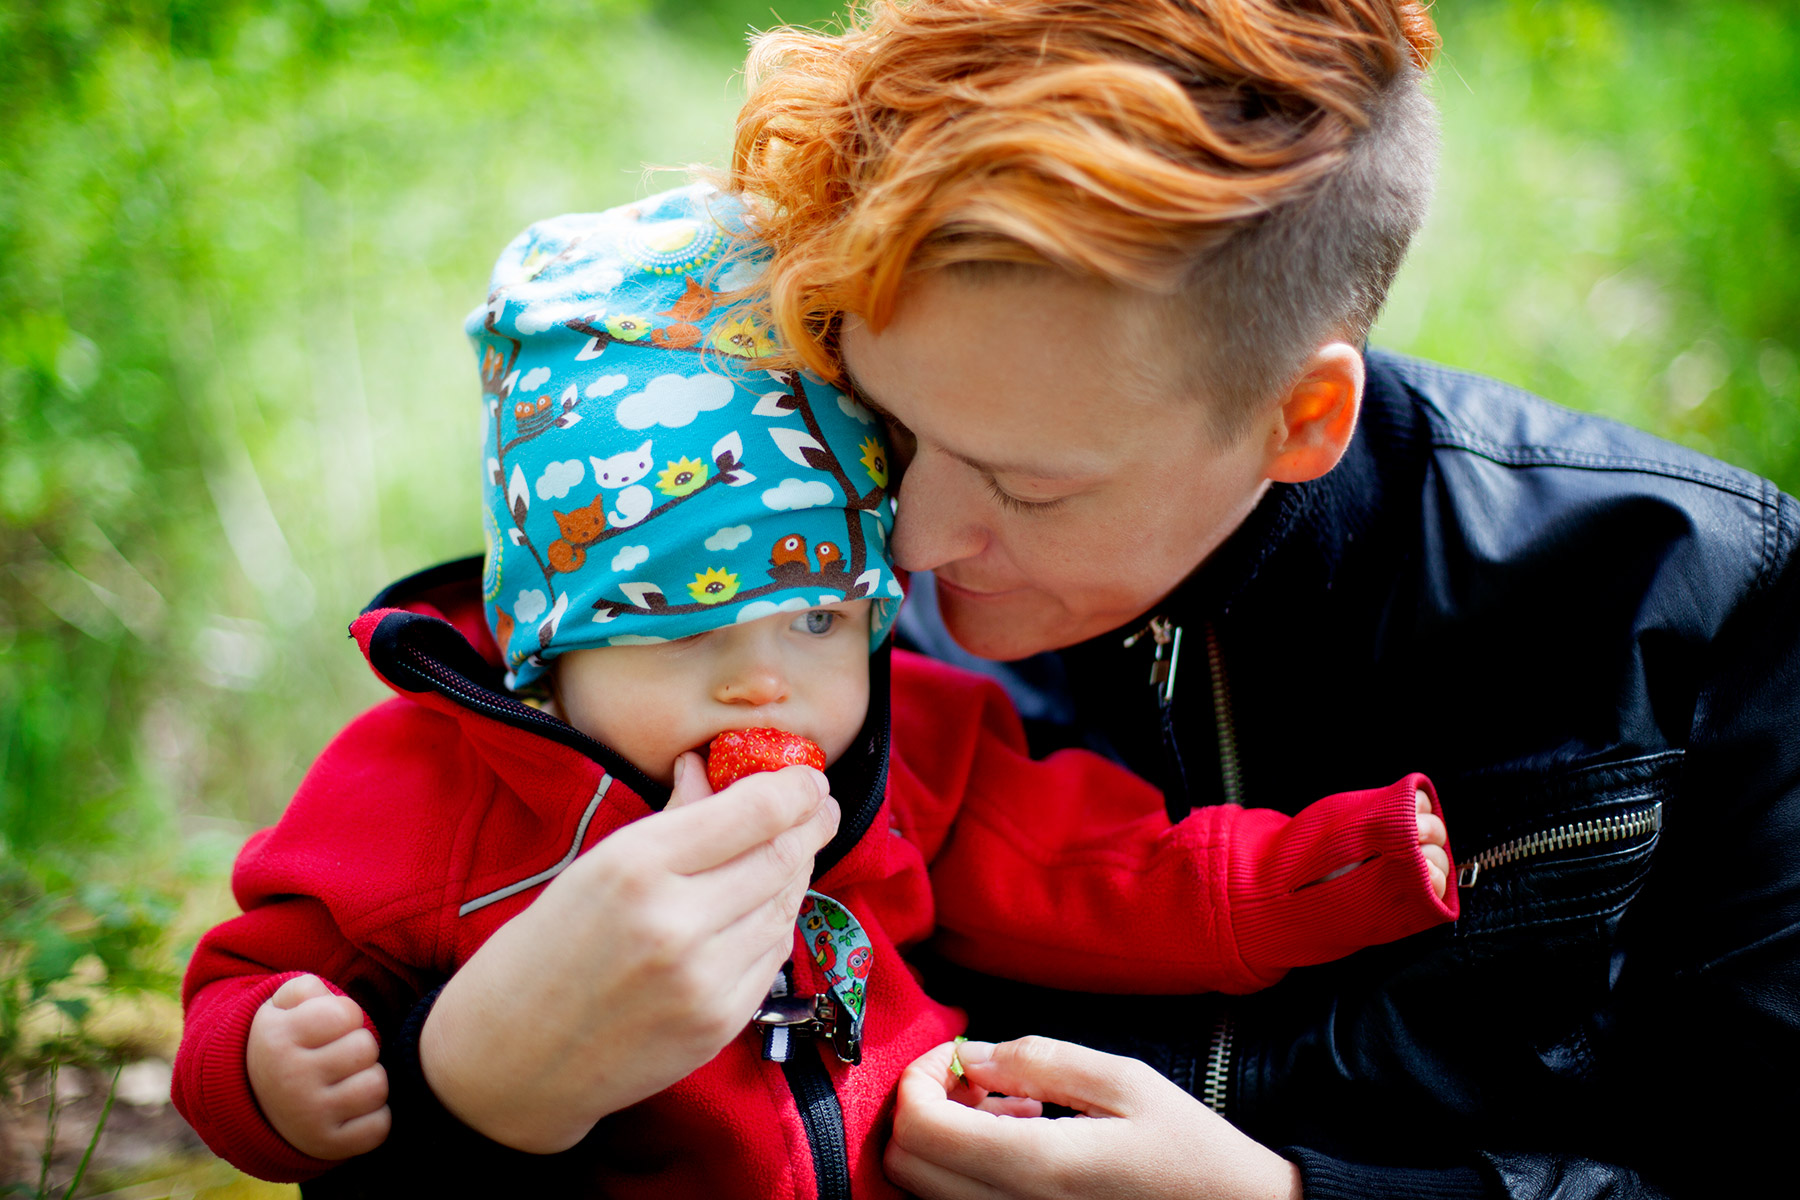 blogg-150525gasevadsholm6.jpg